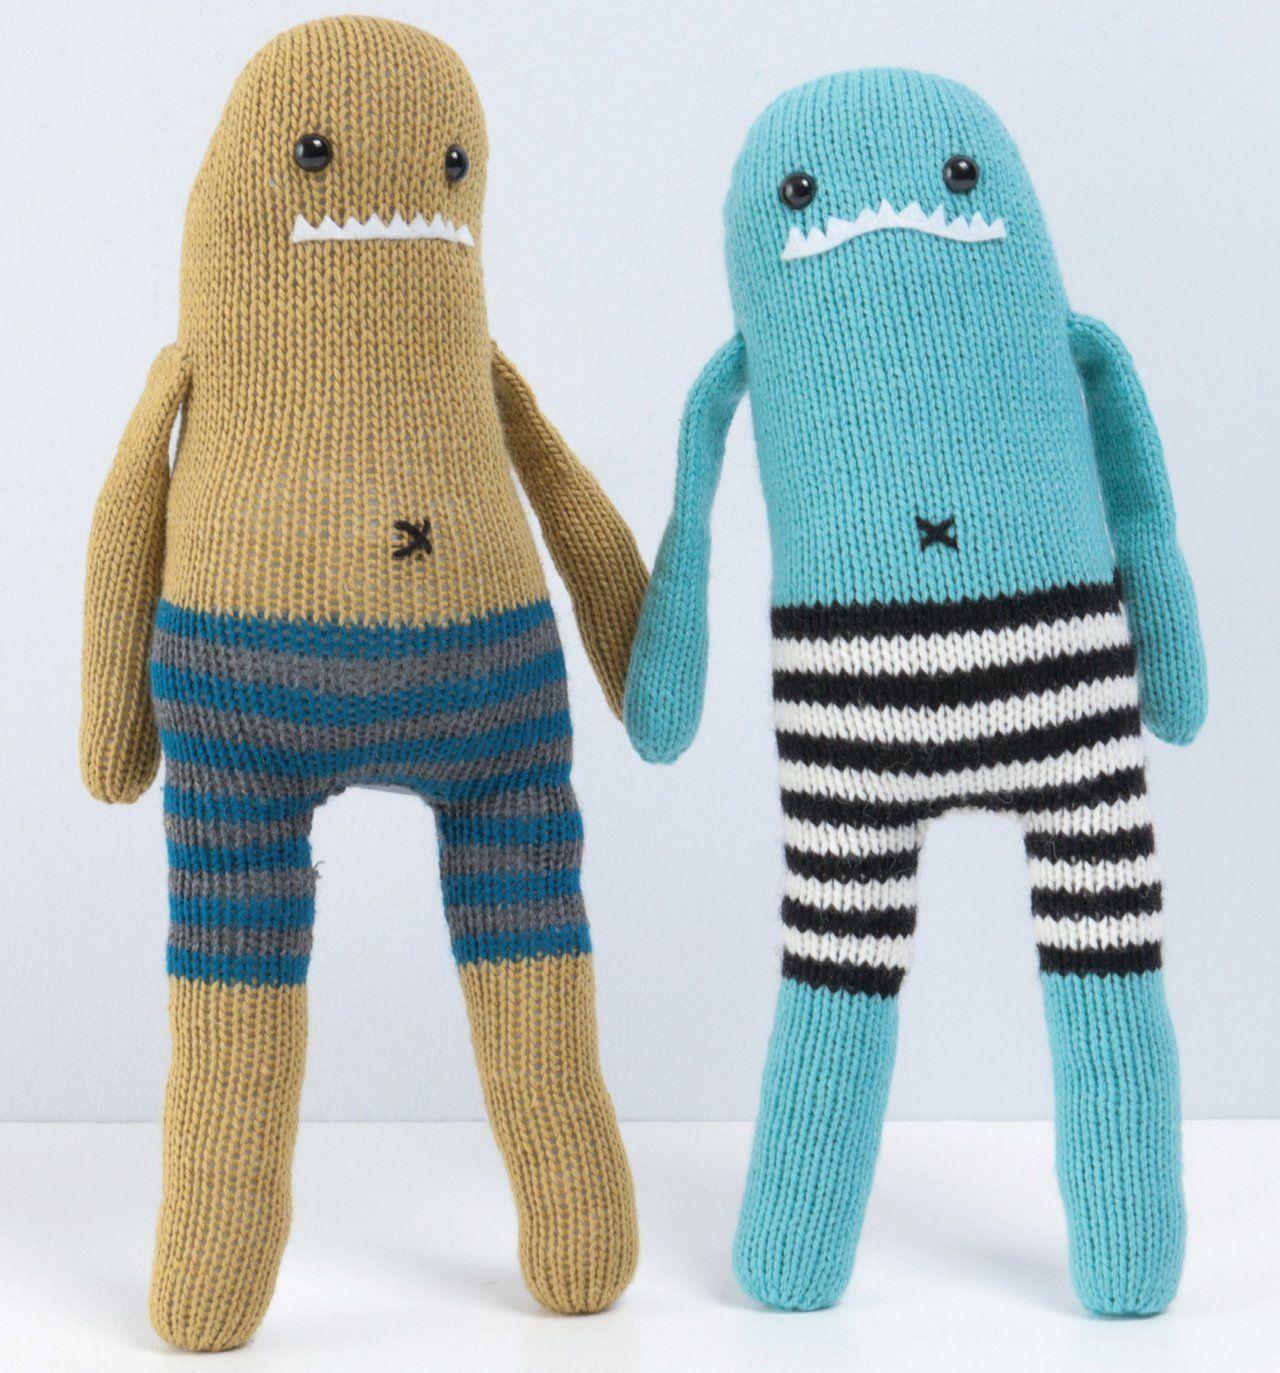 Knit a Monster Nursery: